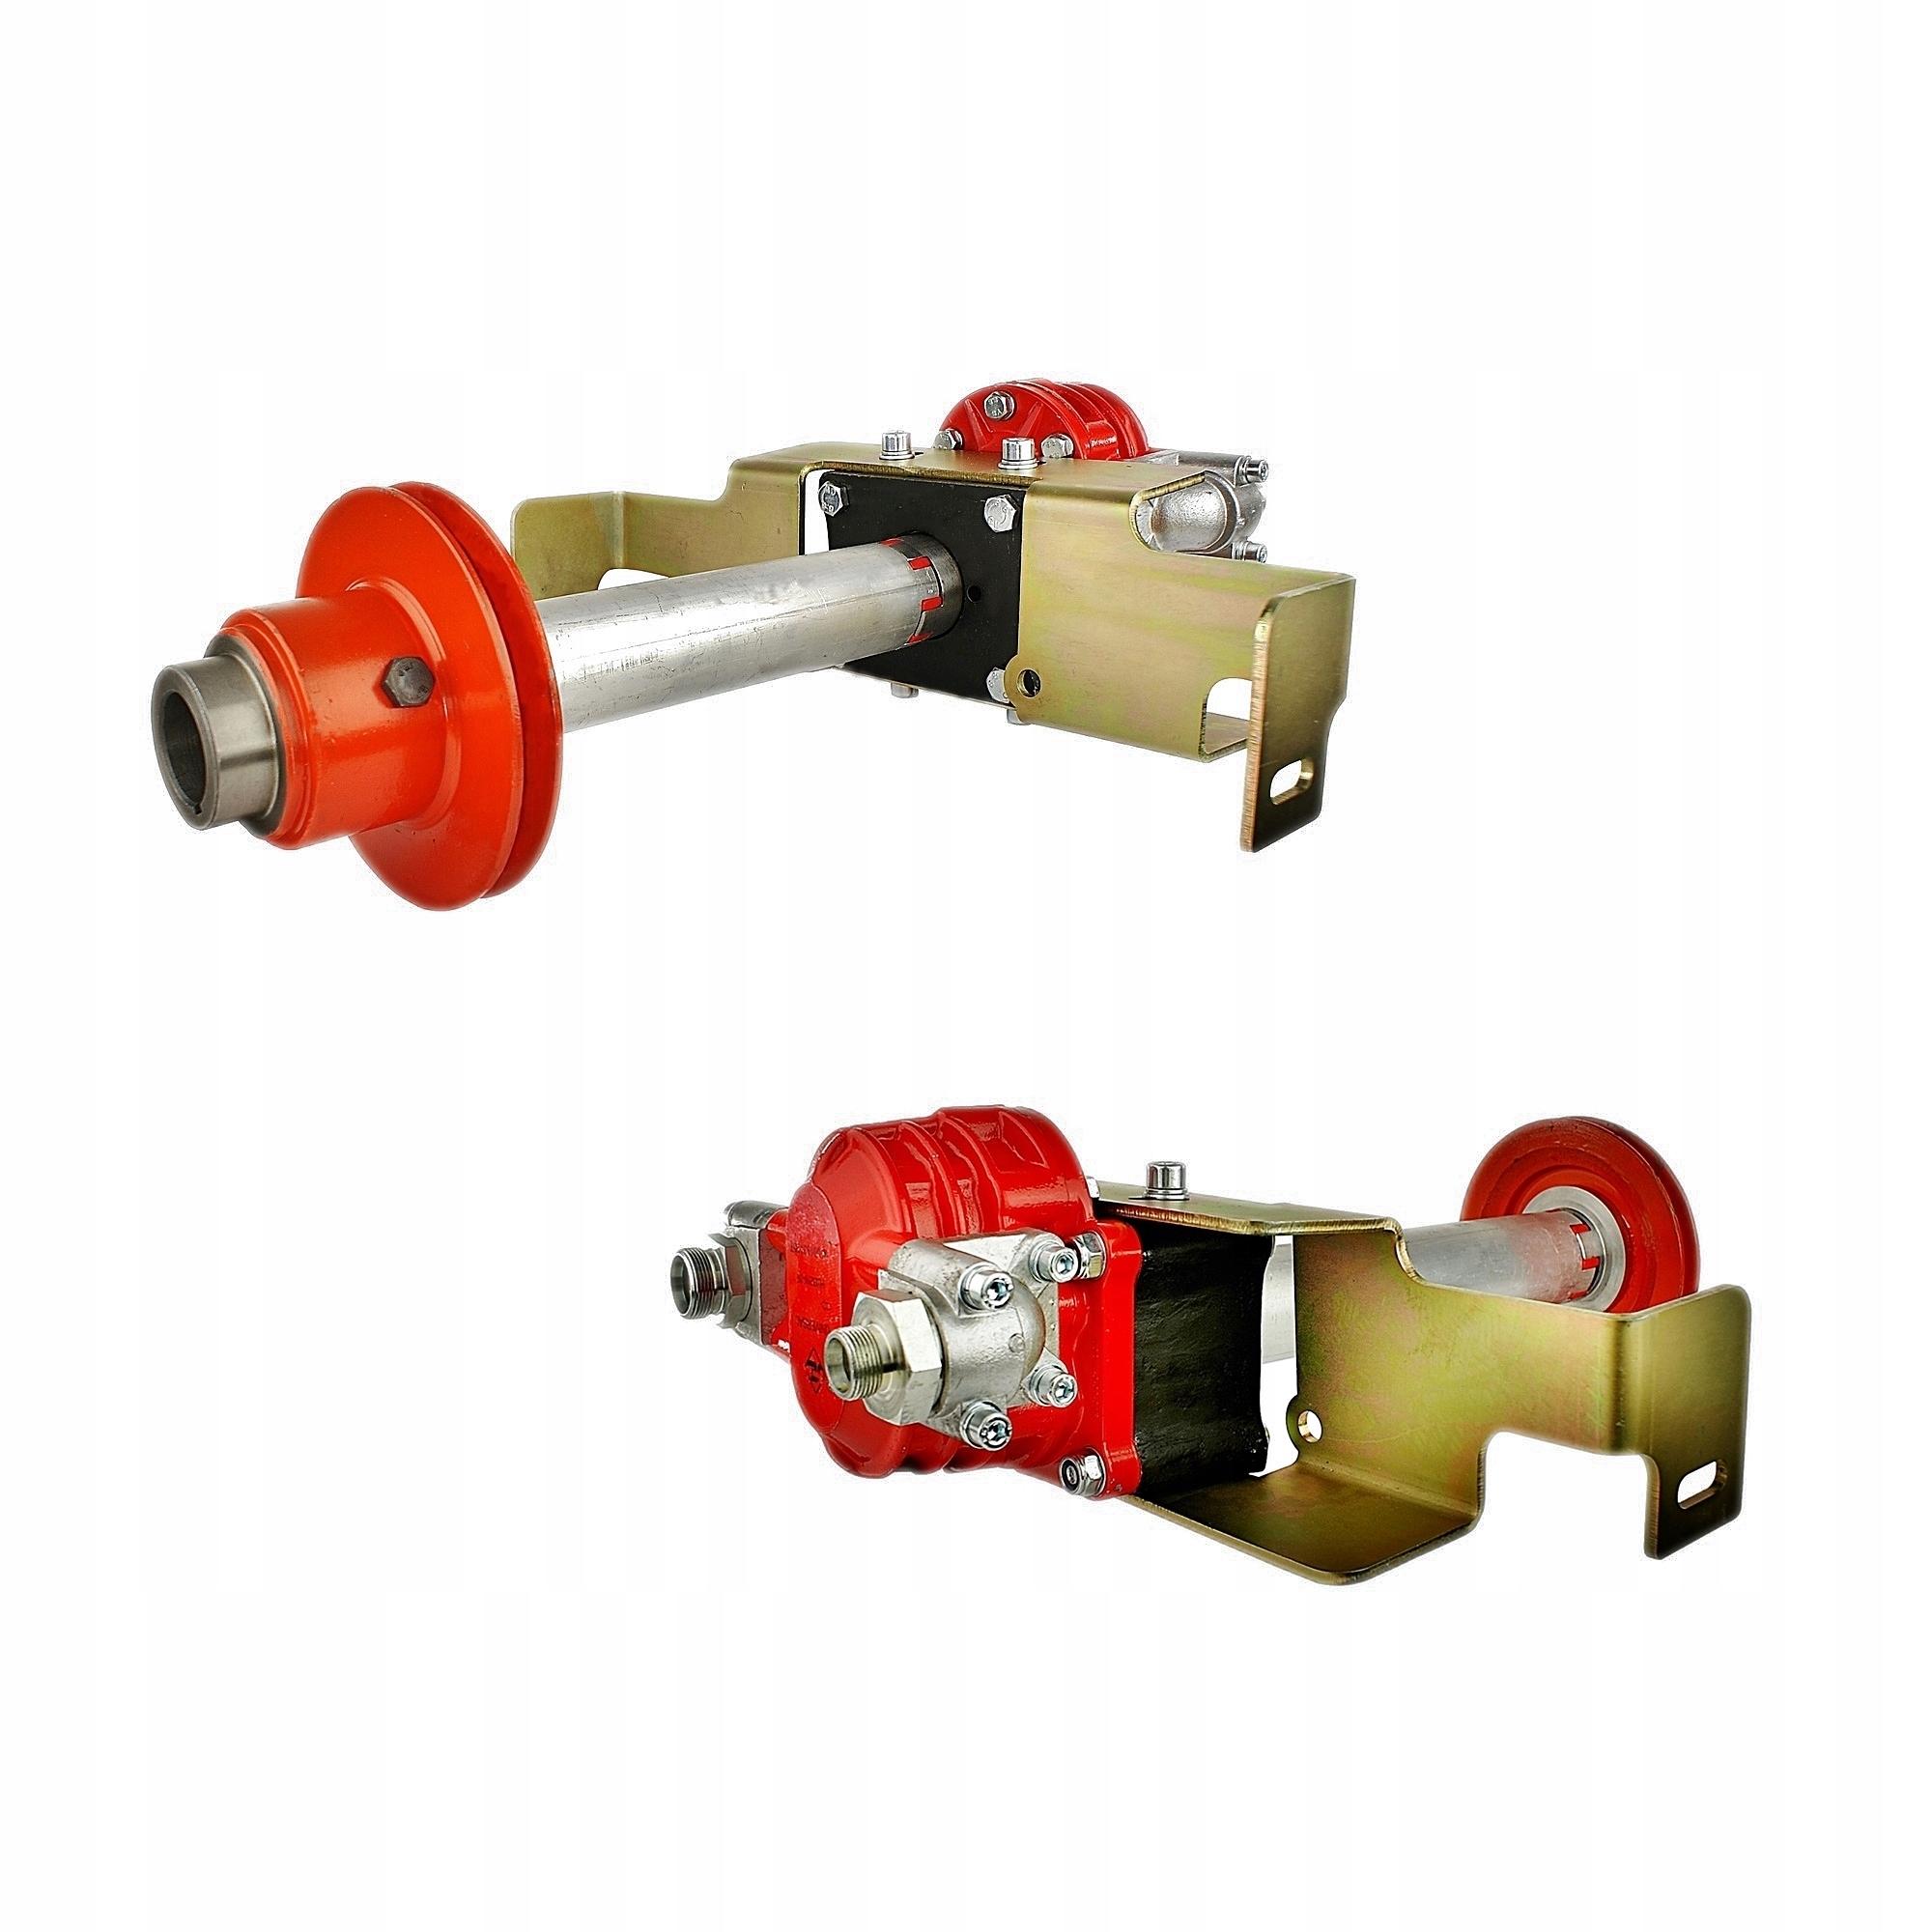 Гидравлический насос C-360-3P привод от вала 76 л / мин